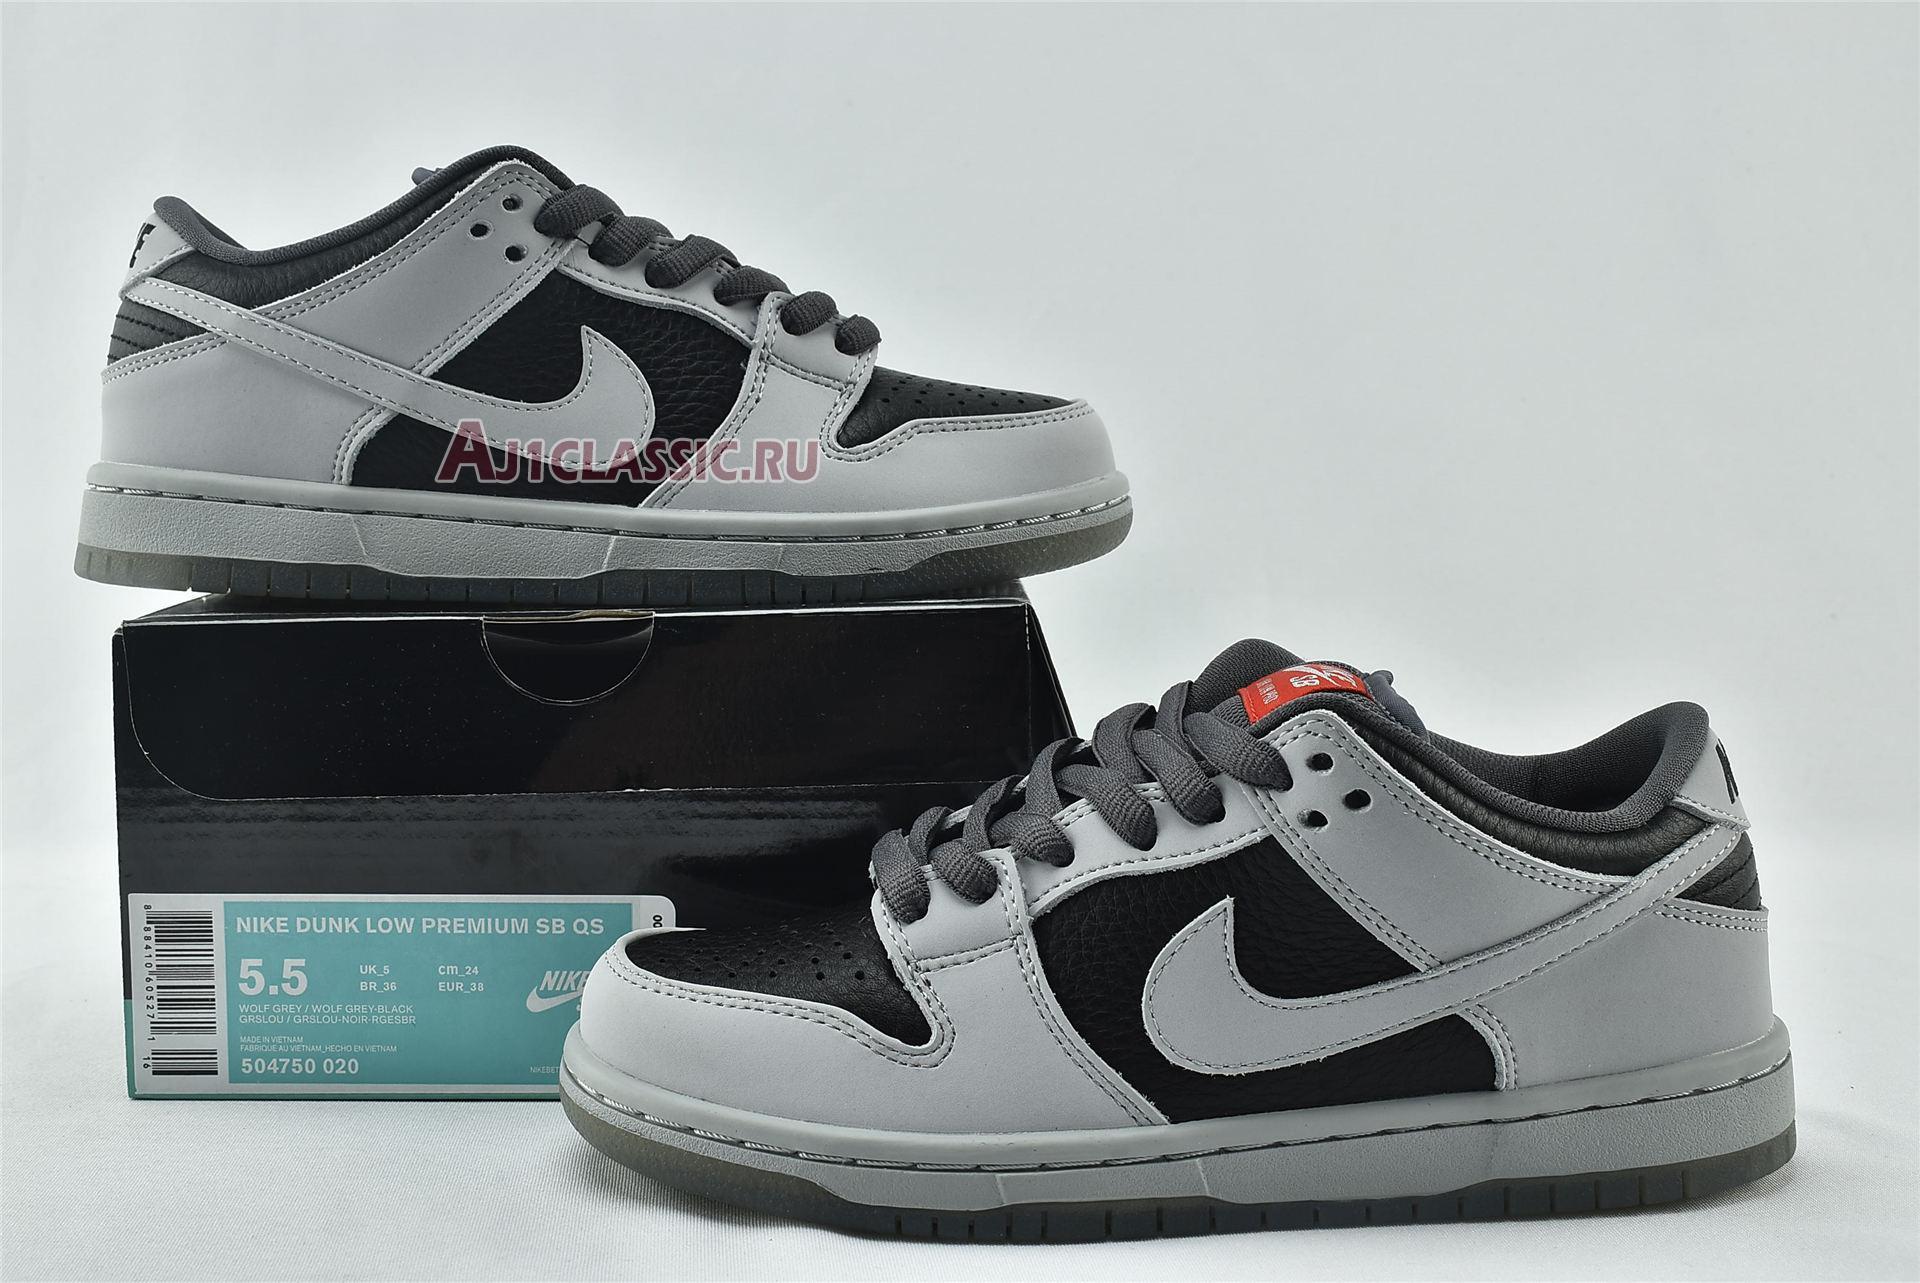 "Atlas x Nike Dunk Low Premium SB ""Wolf Grey"" 504750-020"